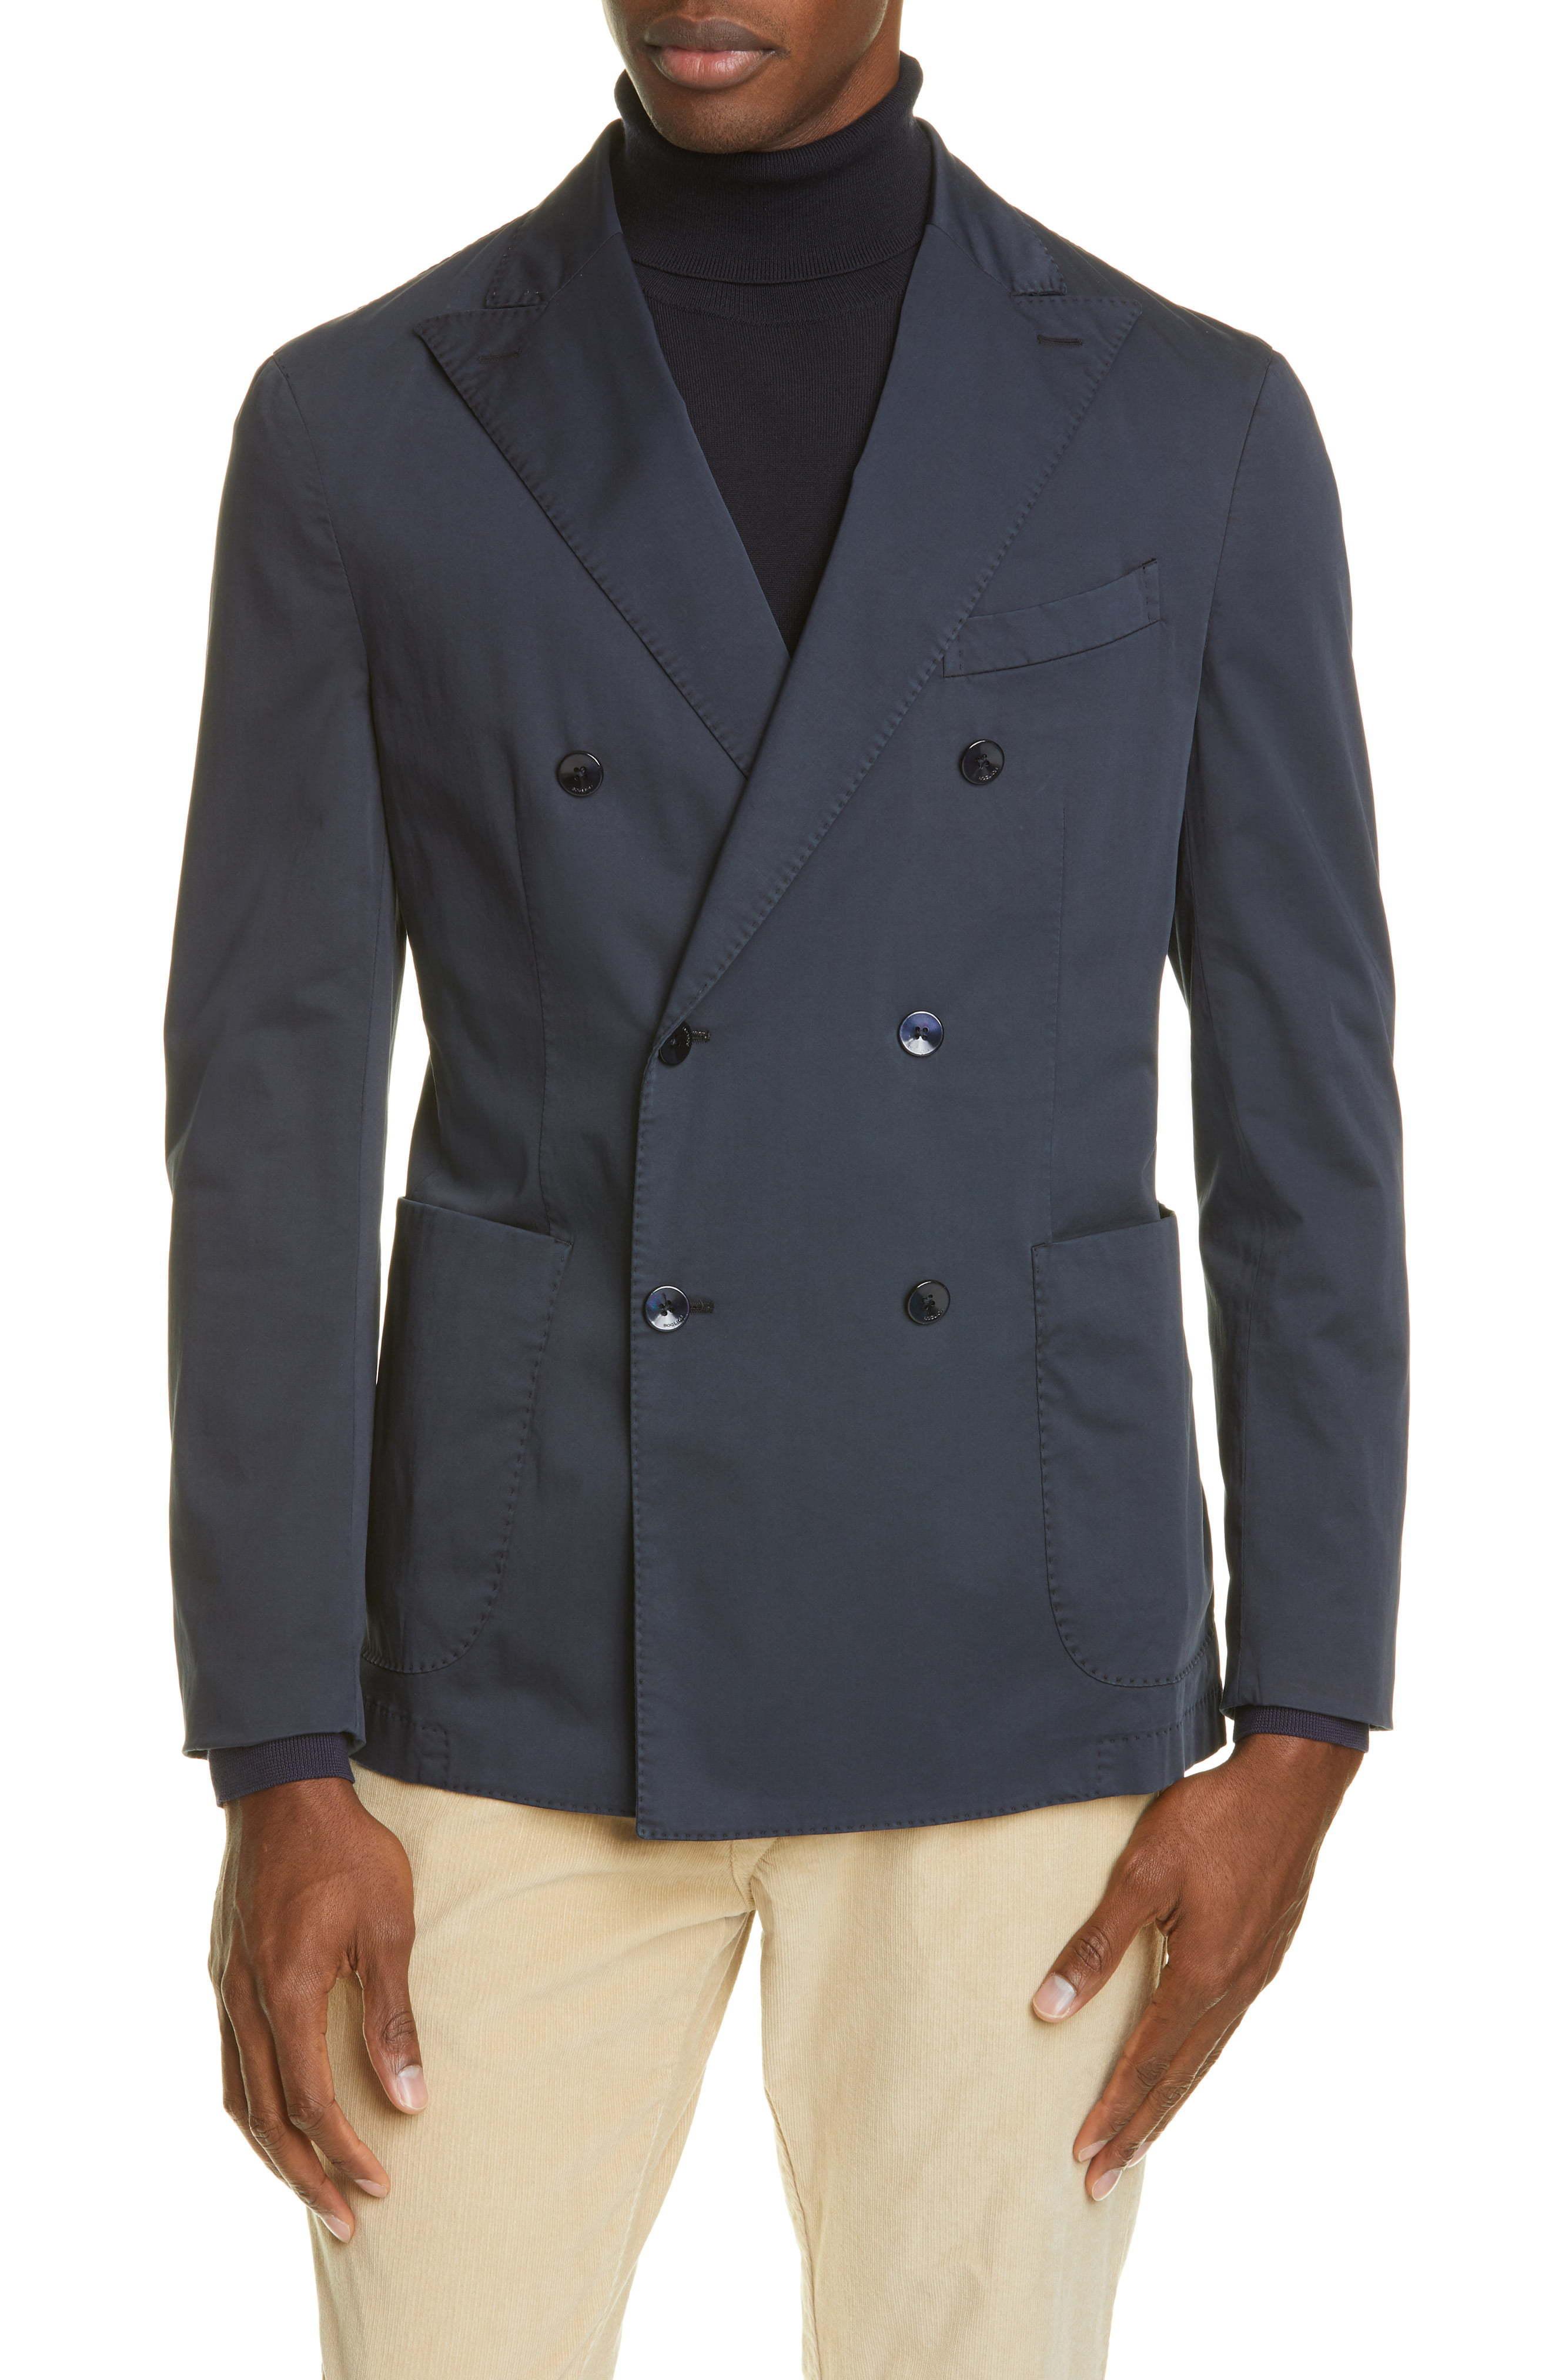 Boglioli Trim Fit Double Breasted Solid Stretch Cotton Sport Coat